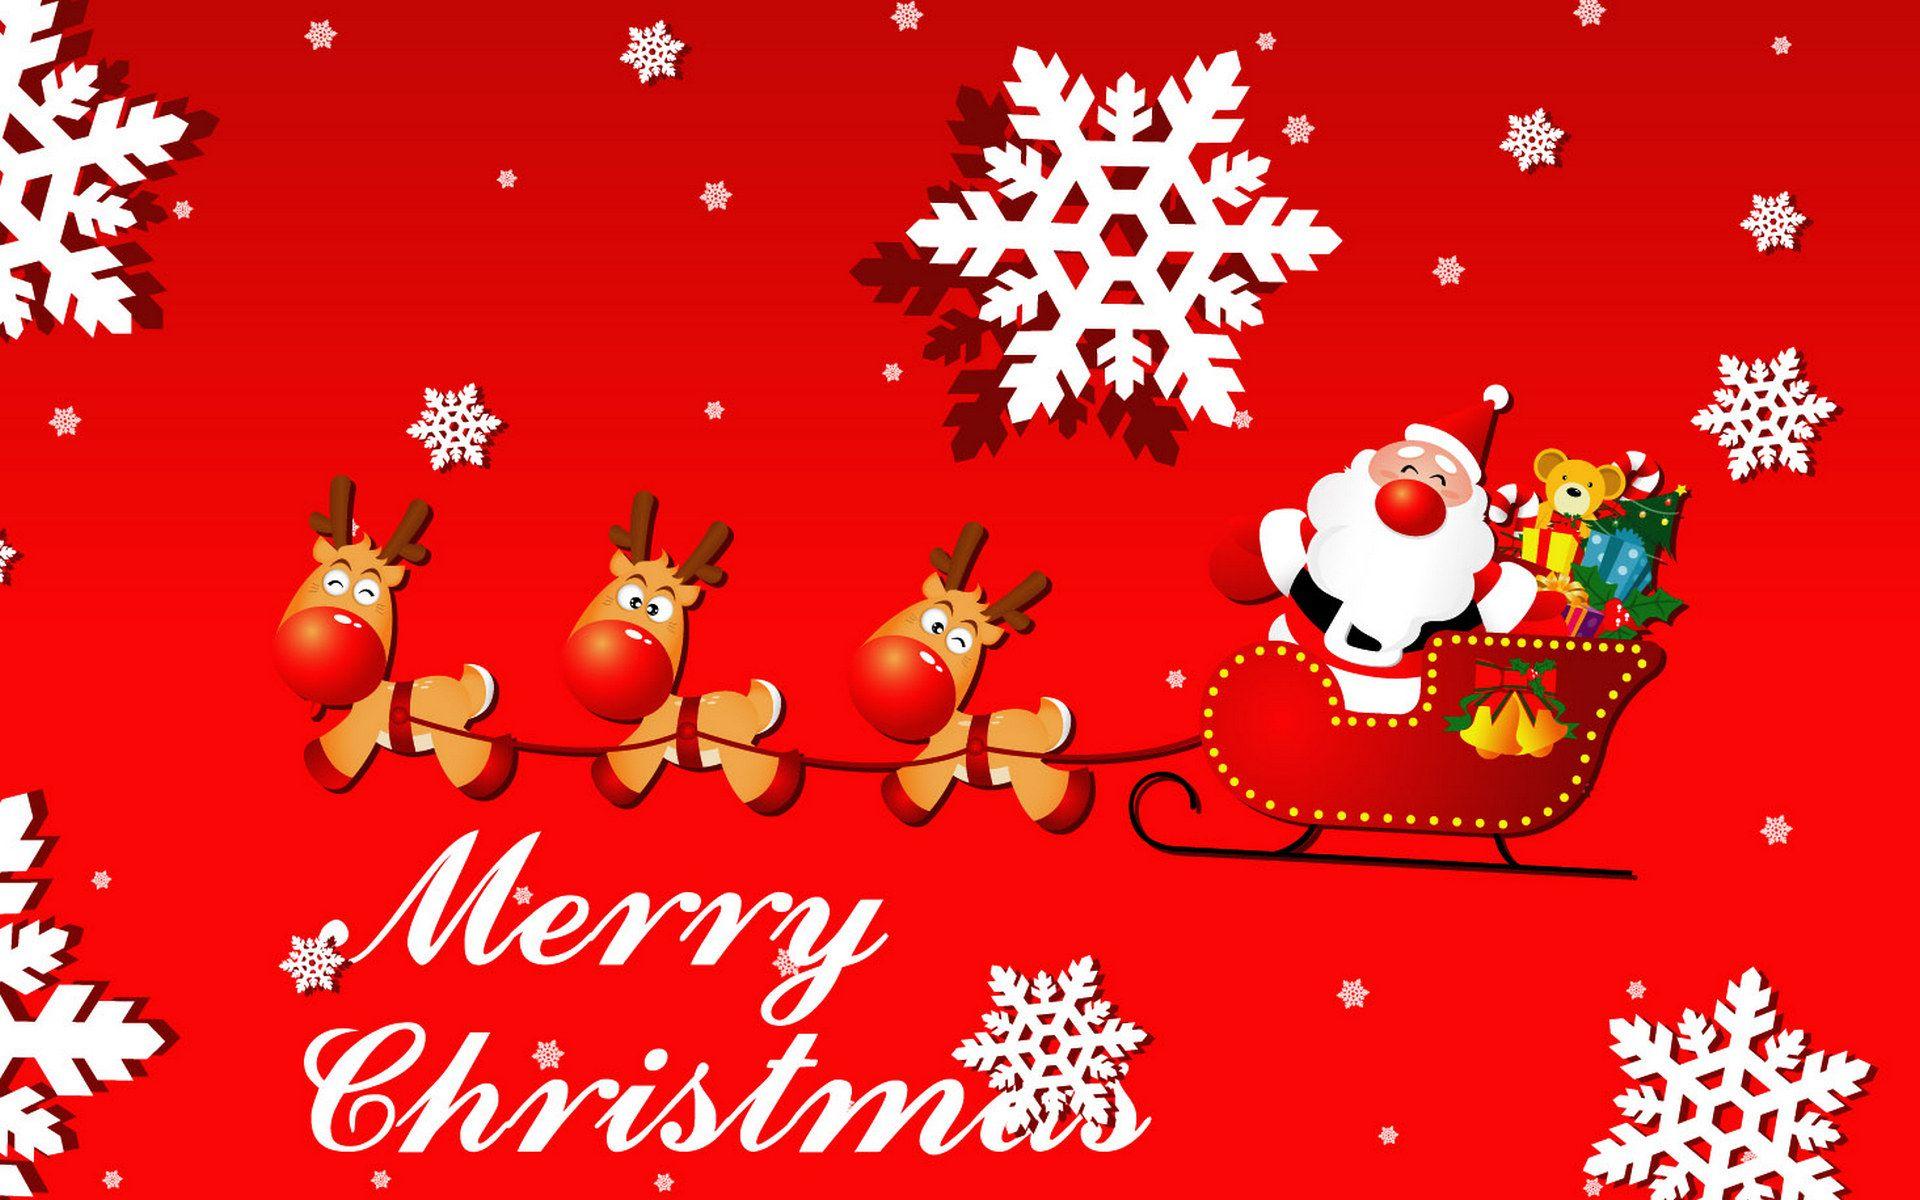 Xmas Greetings Merry Christmas Pinterest Santa Claus Images